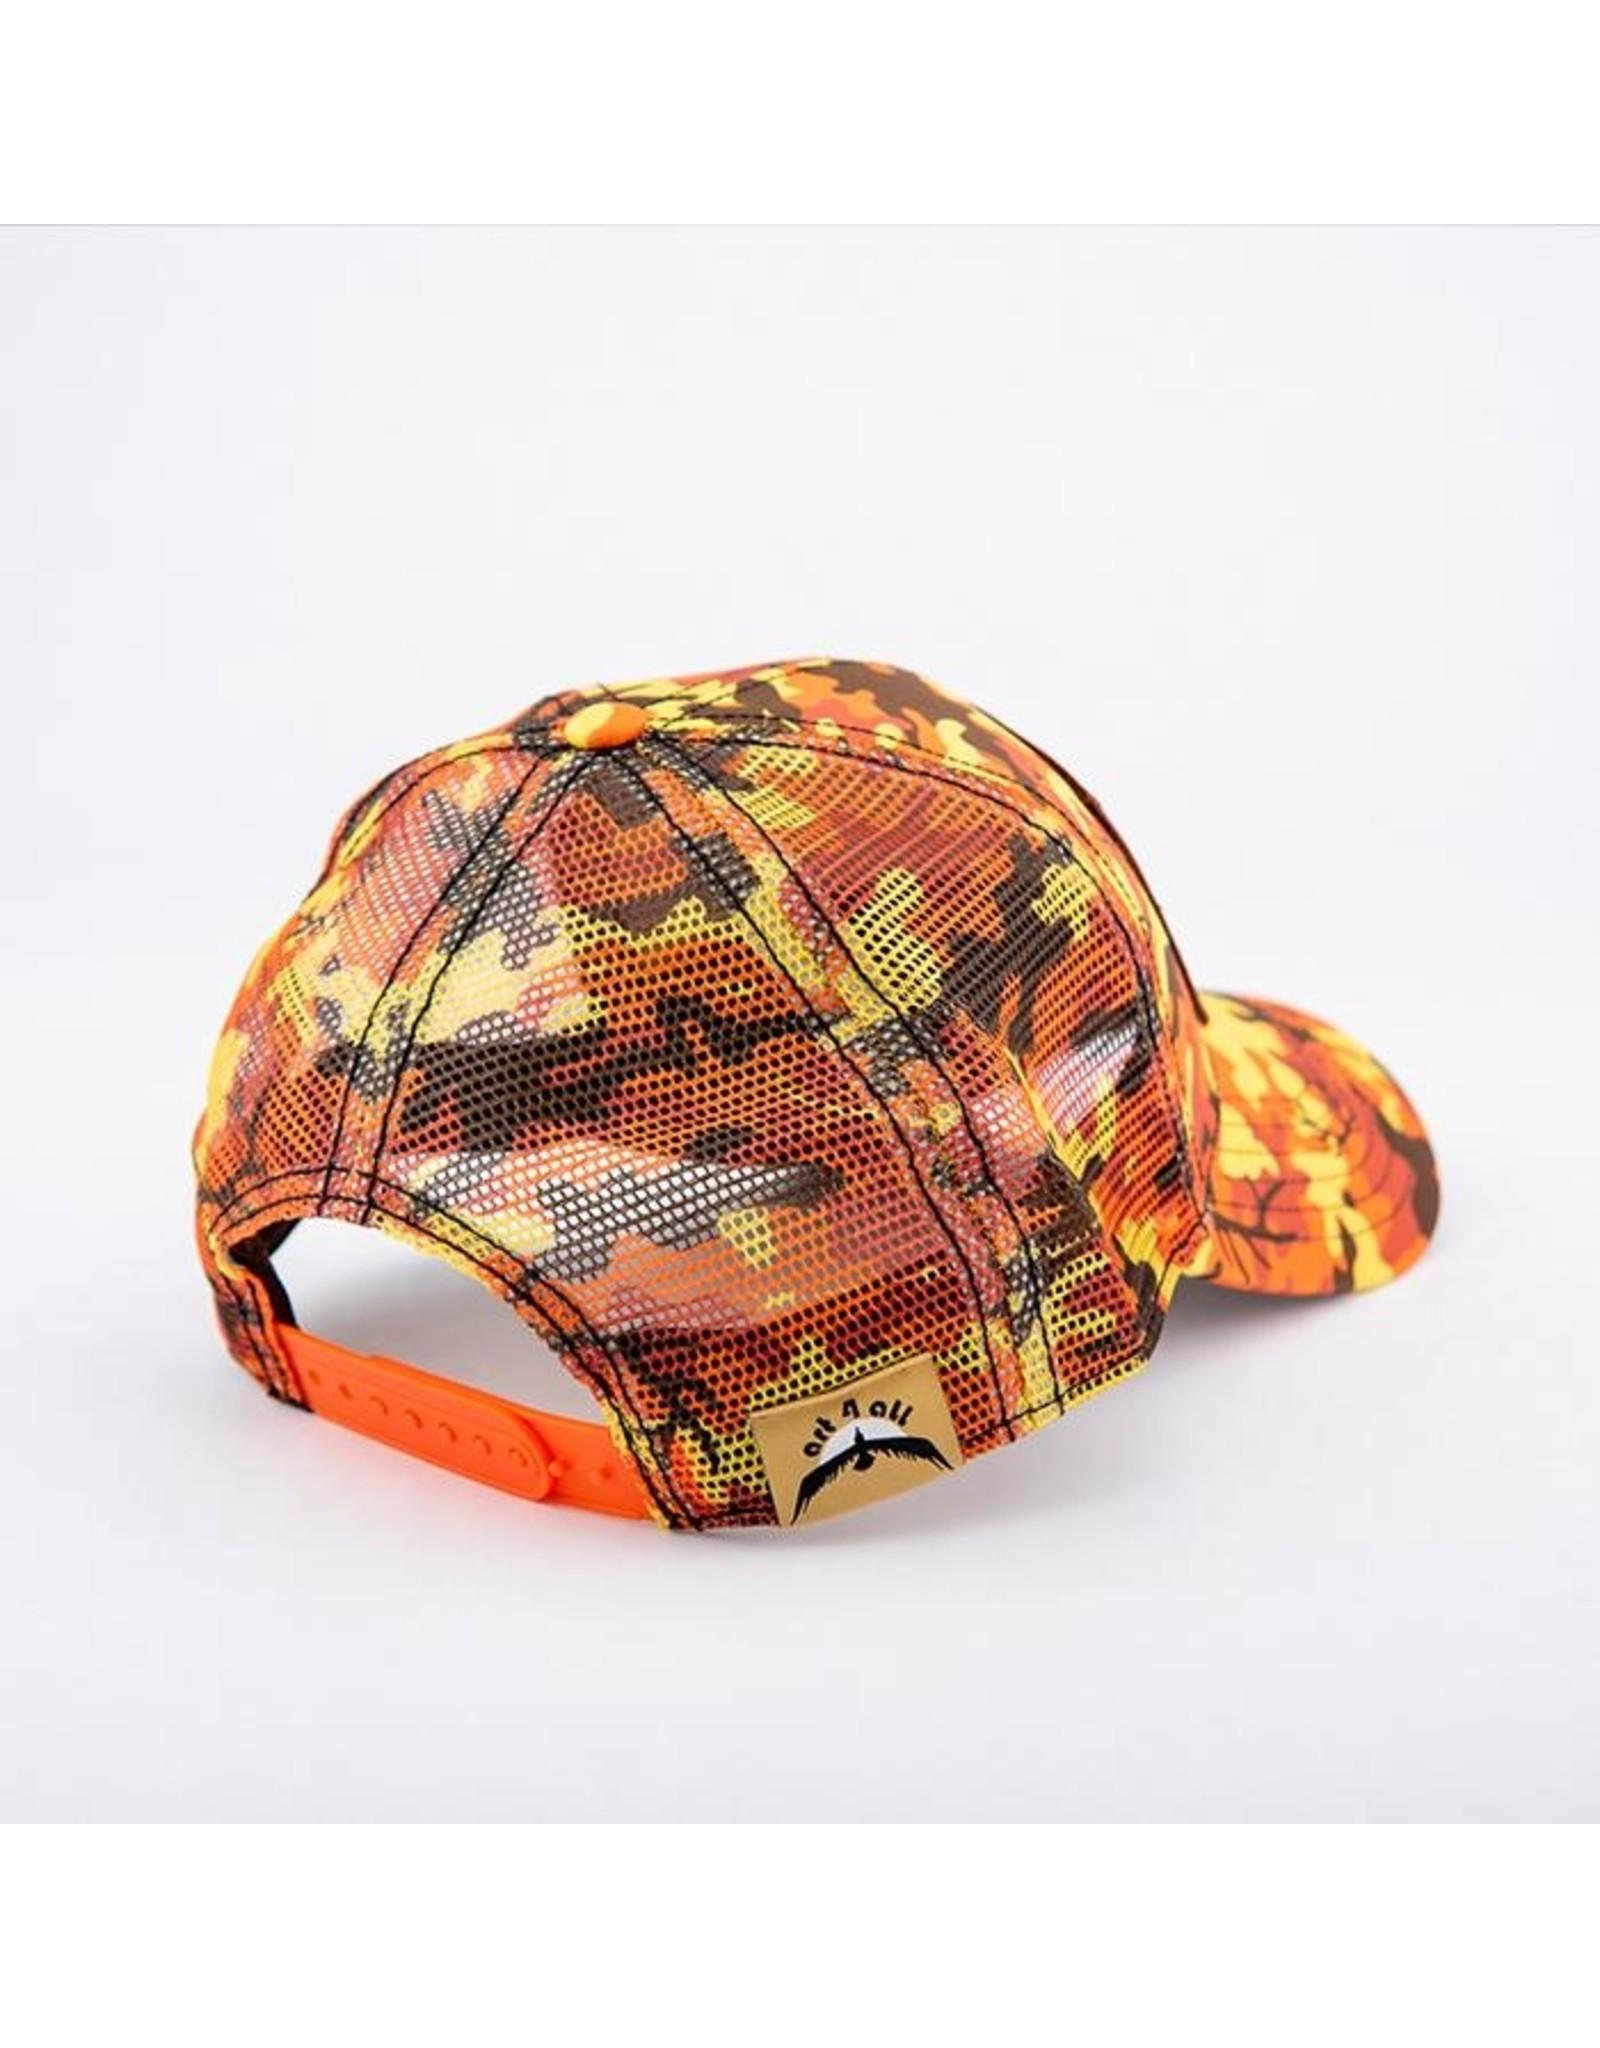 Art 4 All Art 4 All - Buck Dusk Blaze Orange Hat